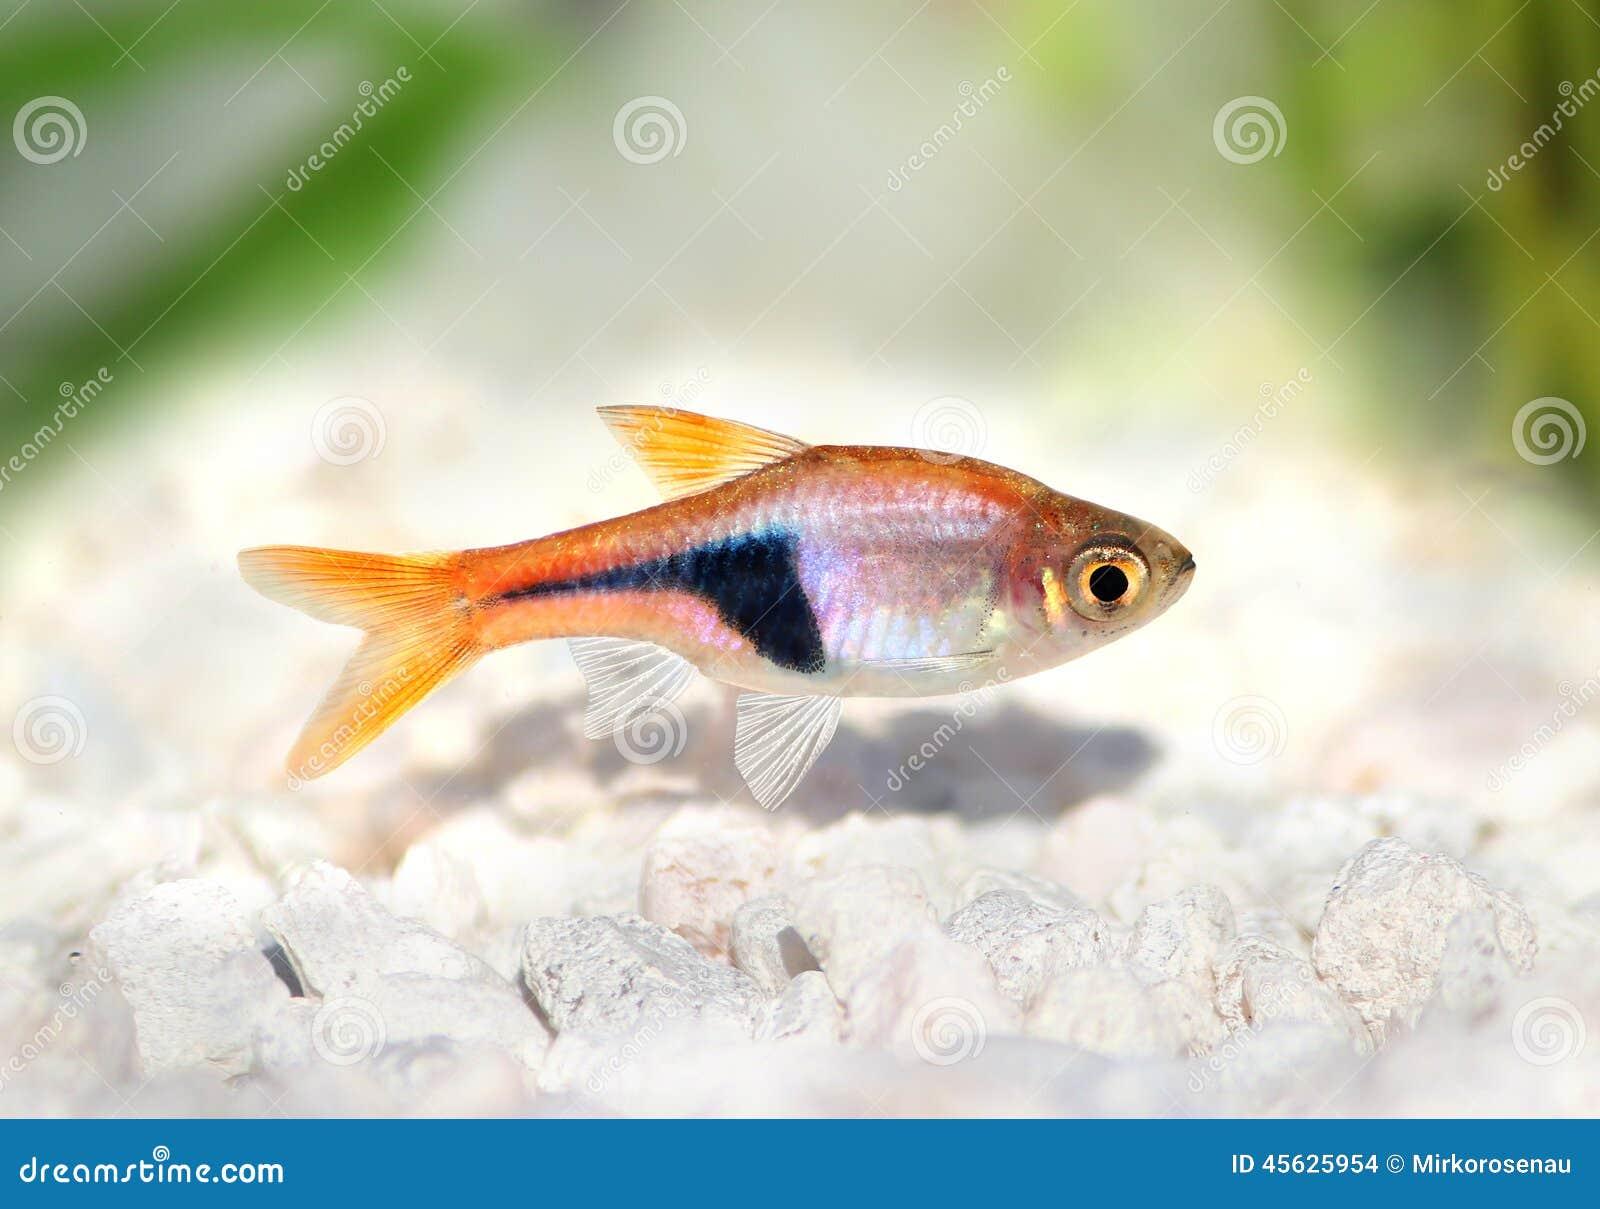 Freshwater aquarium fish rasbora - Rasbora Het Harlequin Rasbora Heteromorpha